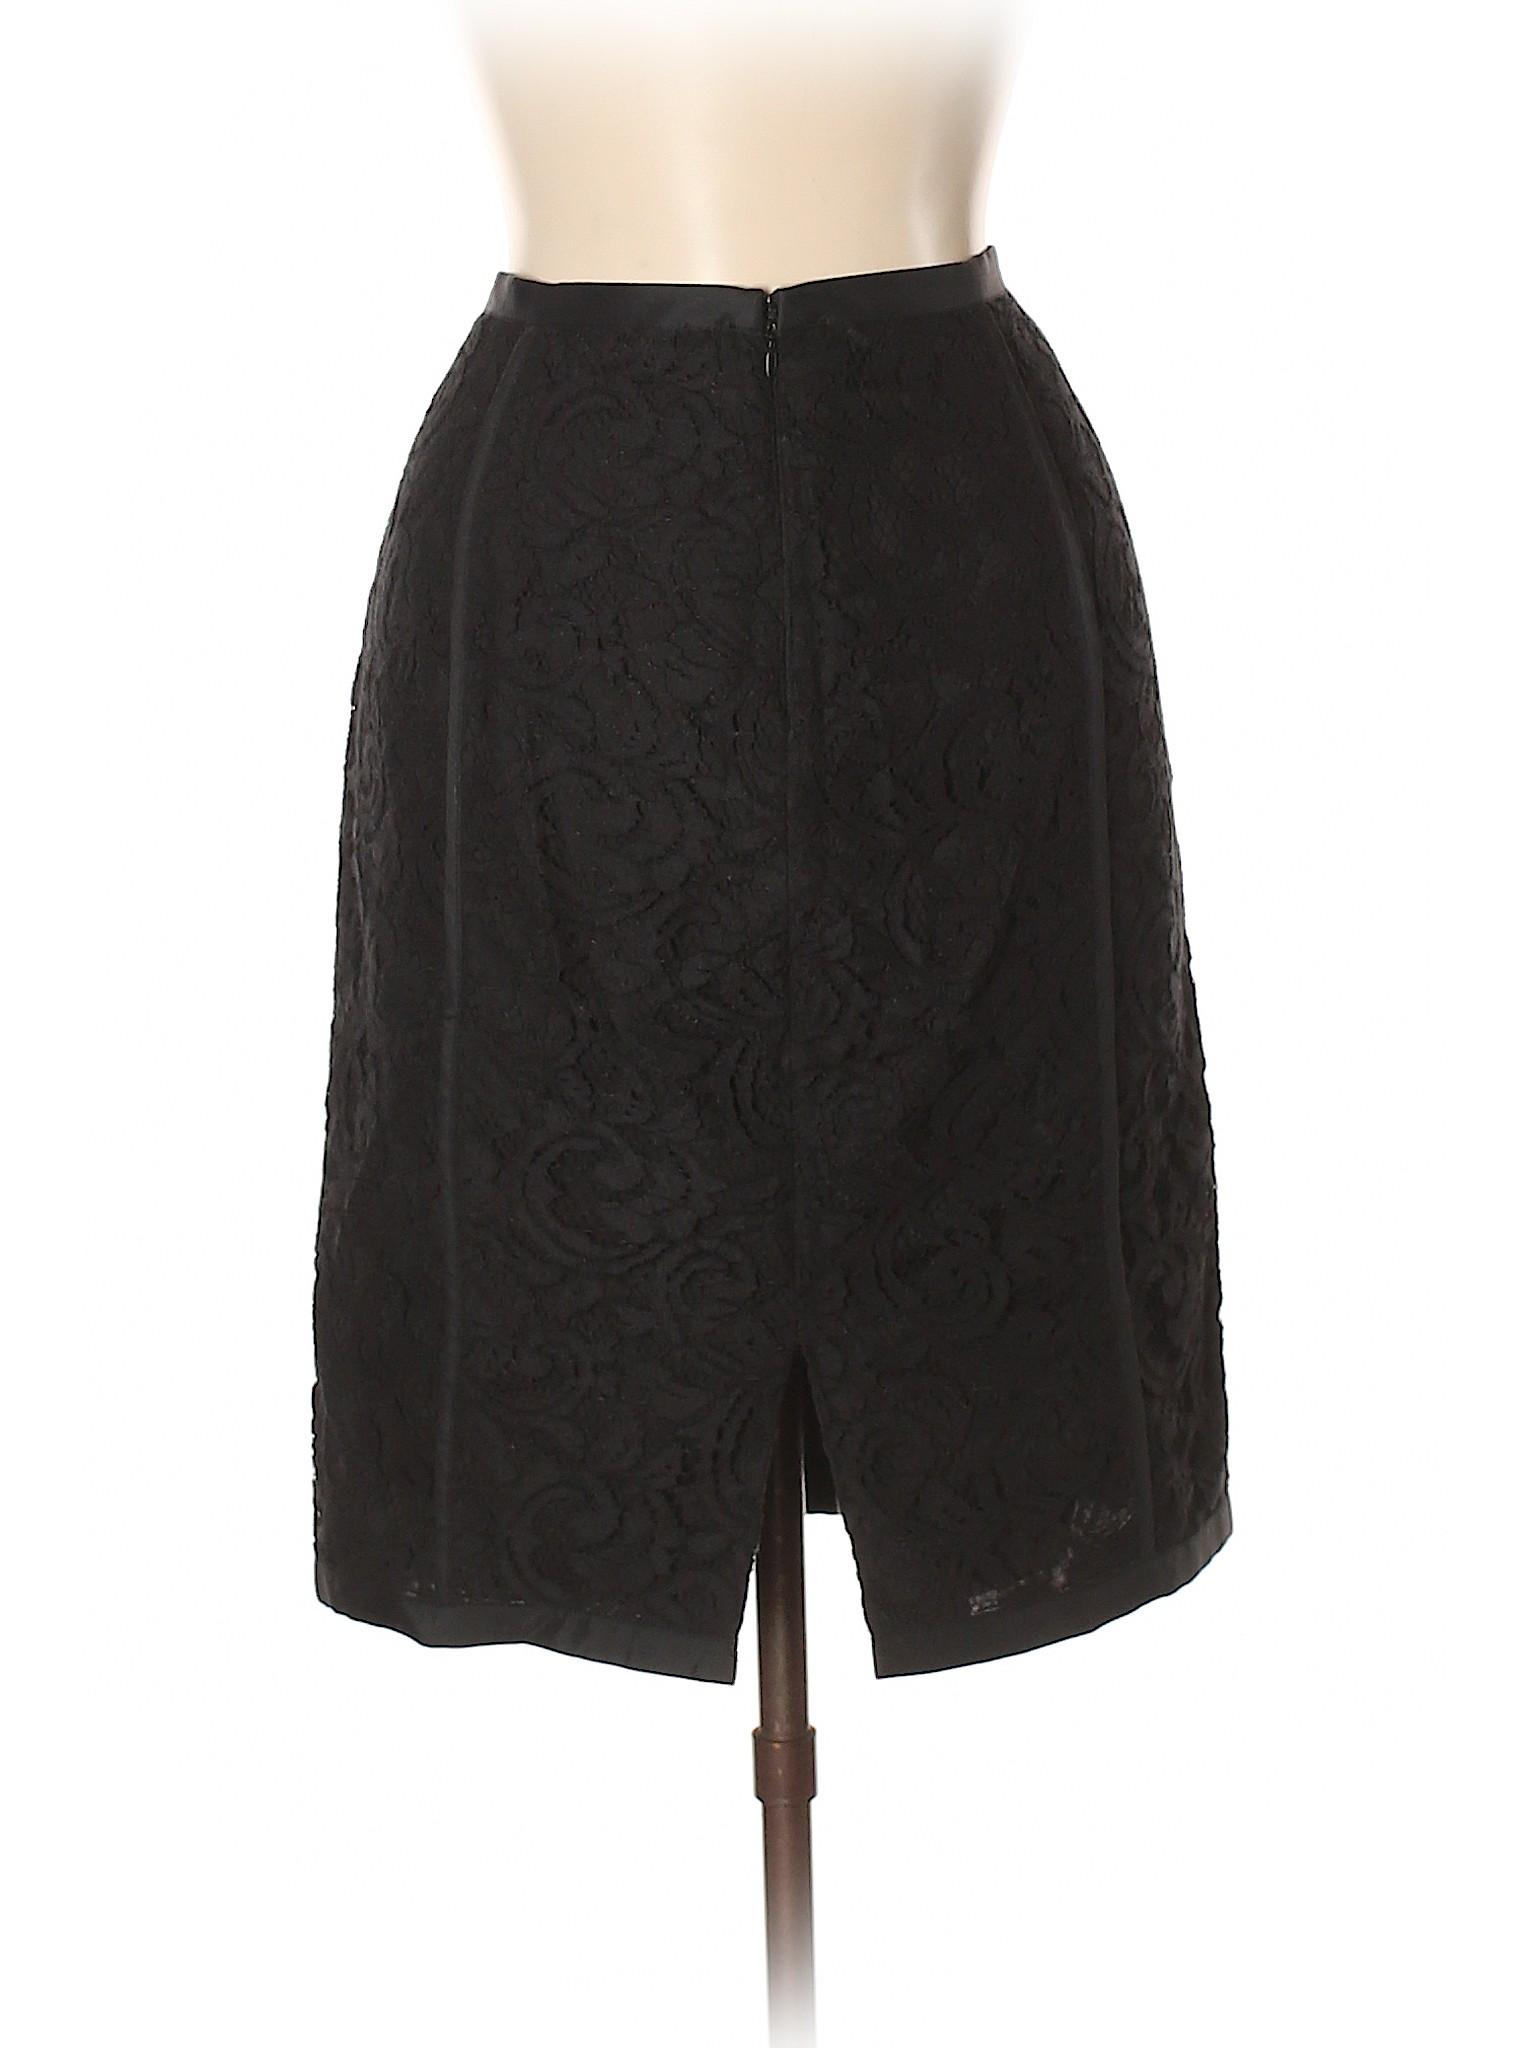 Republic Casual Skirt winter Leisure Banana BP0Wz